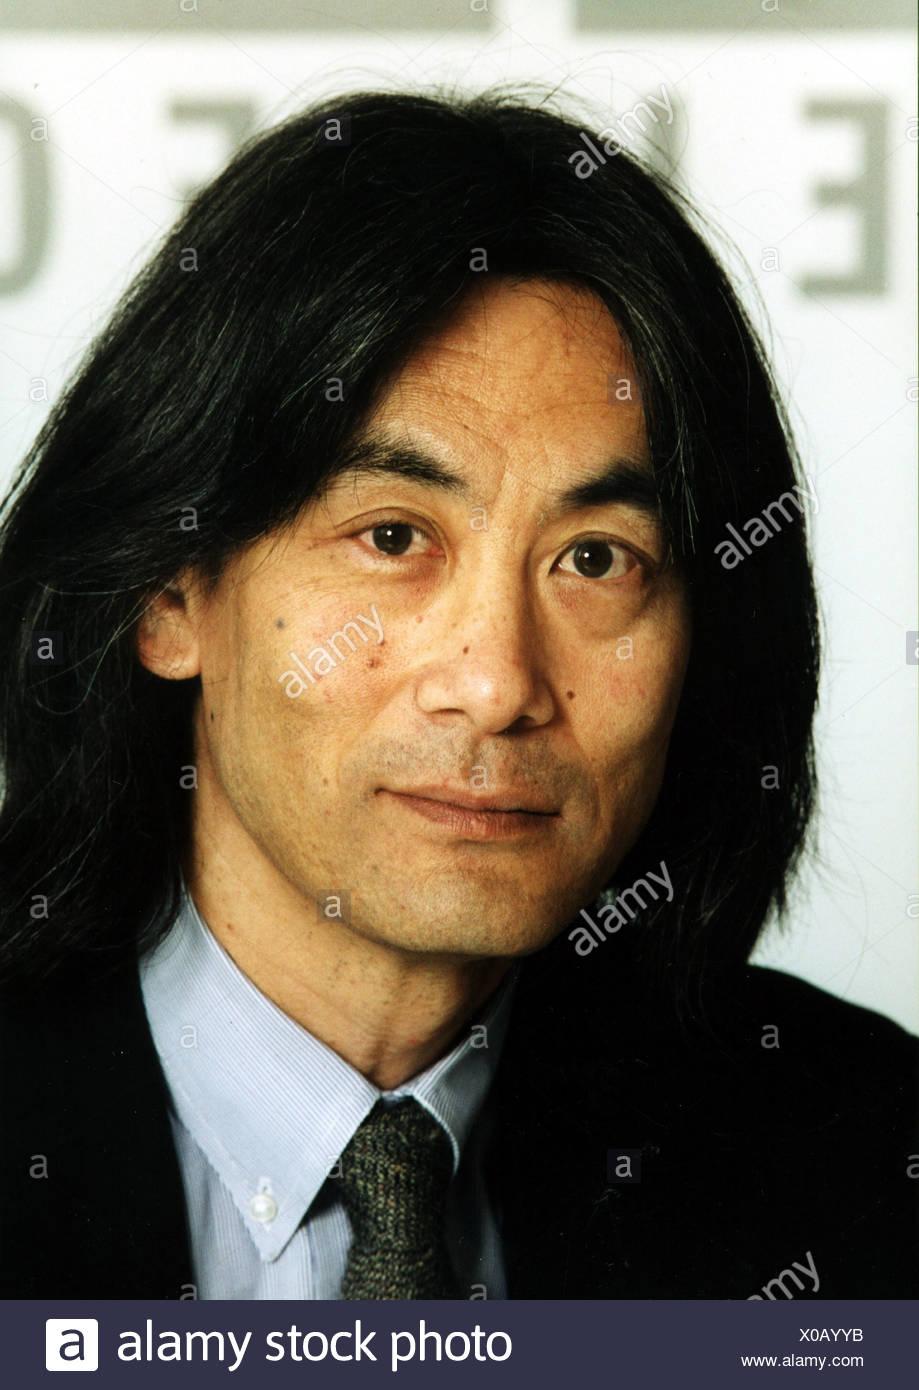 Nagano, Kent, 22.11.1951, US conductor, portrait, 2000, - Stock Image